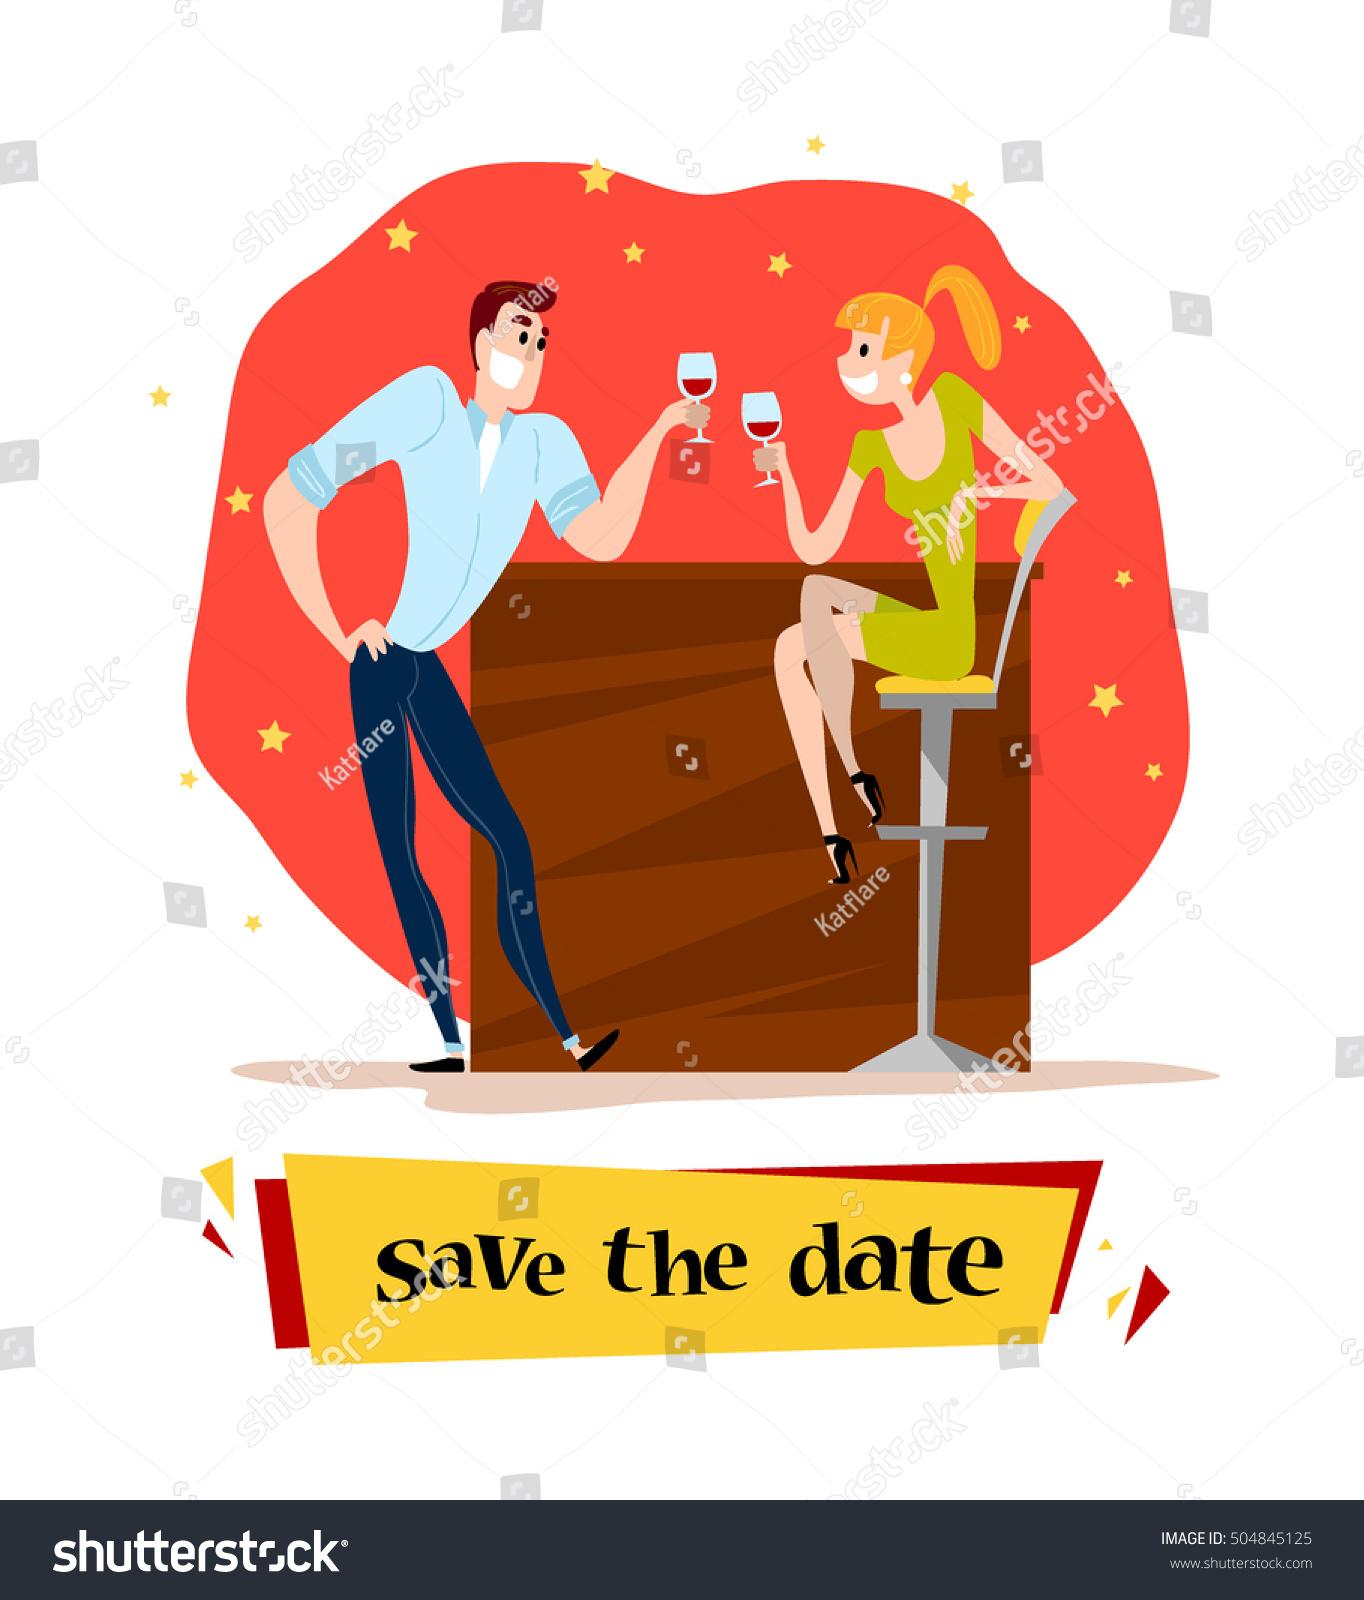 Dating illustration